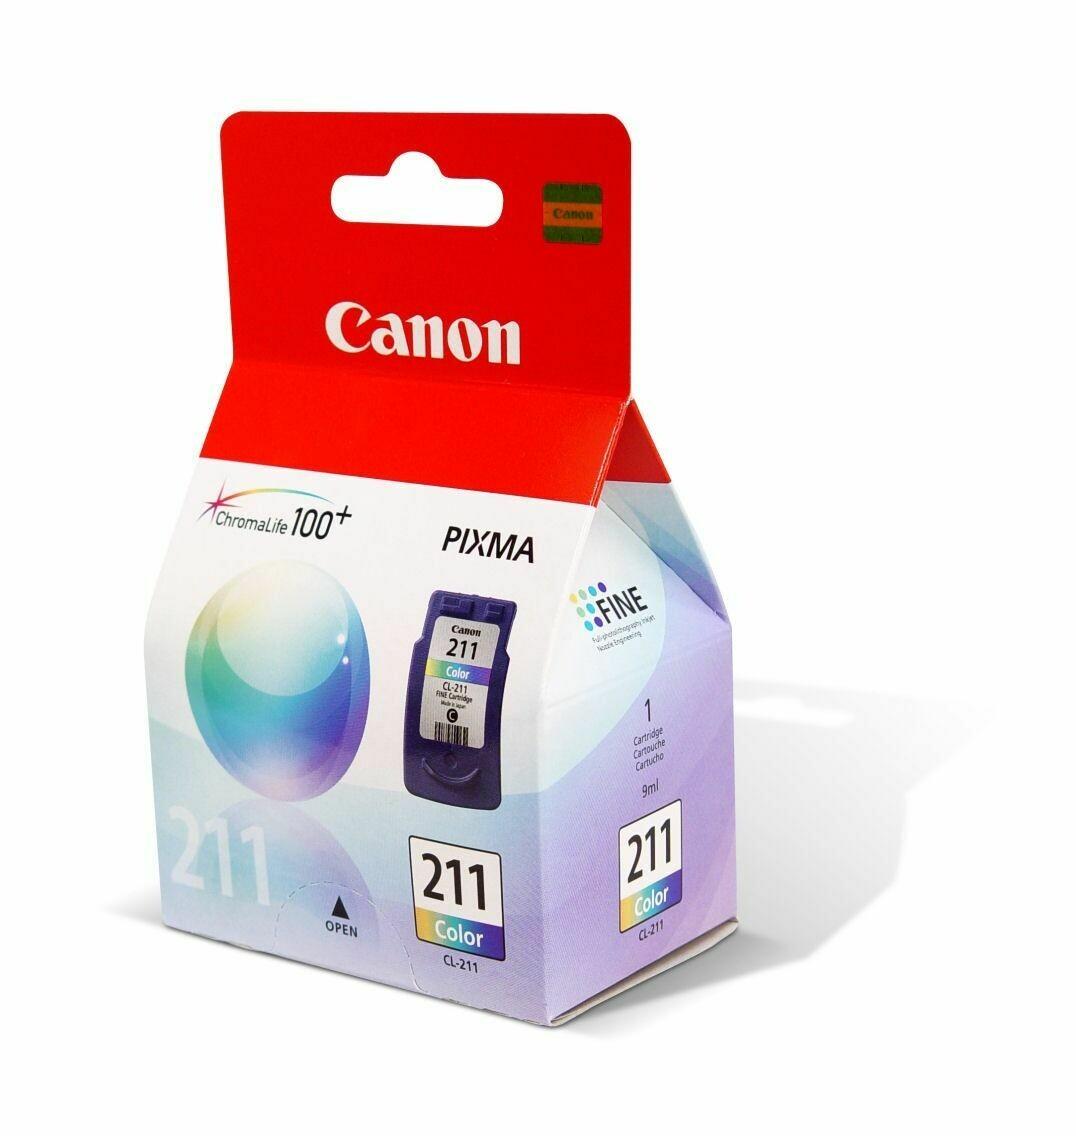 Cartucho original Canon 211 color 9 ml